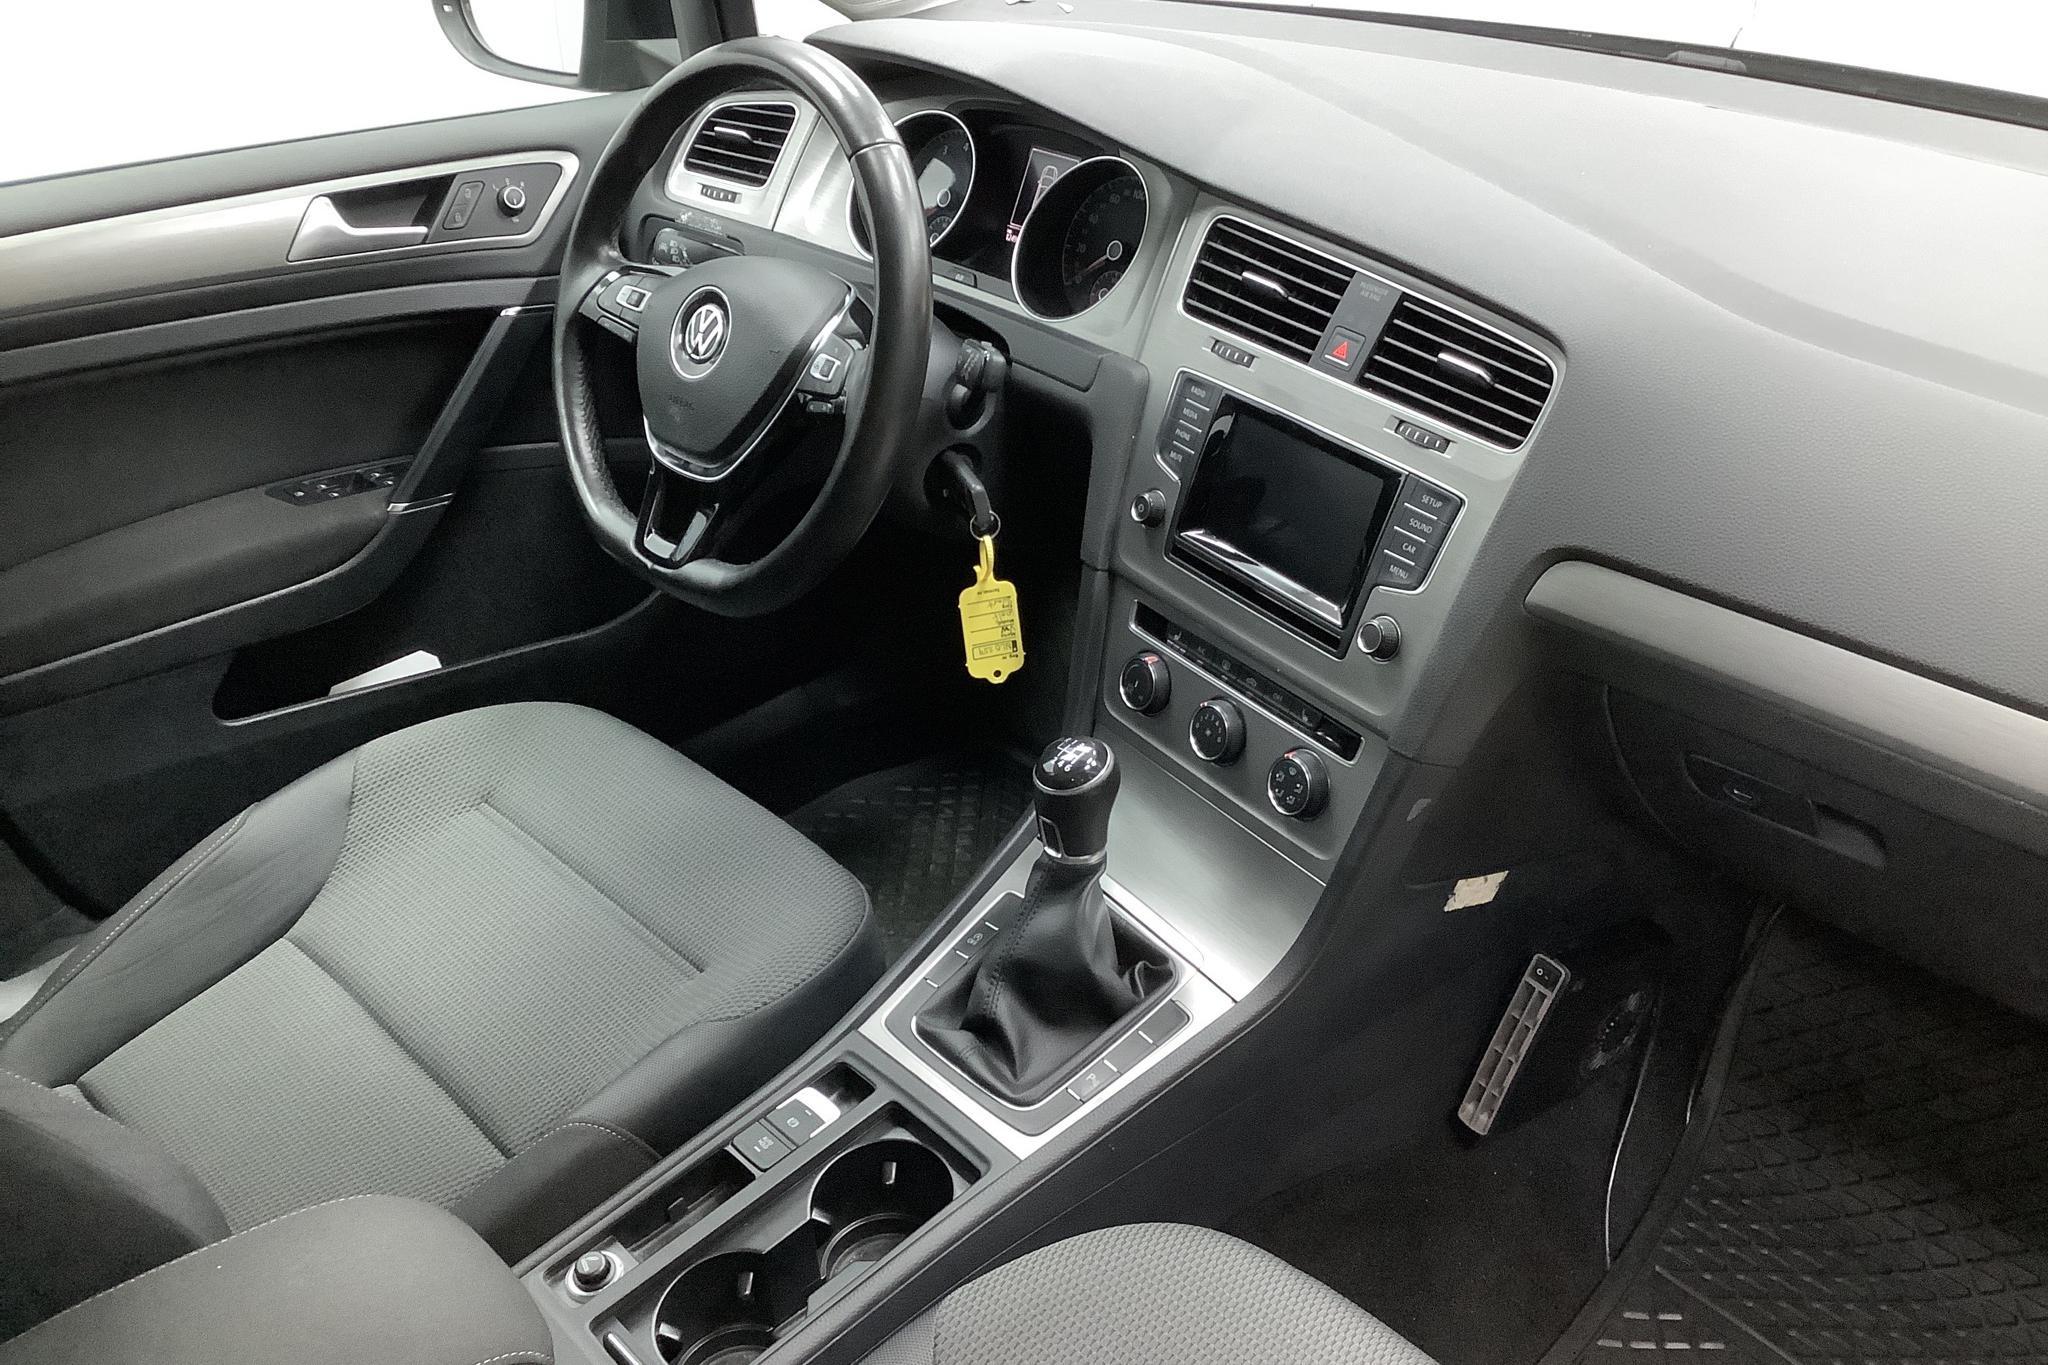 VW Golf VII 1.4 TSI Sportscombi (122hk) - 125 000 km - Manual - black - 2014